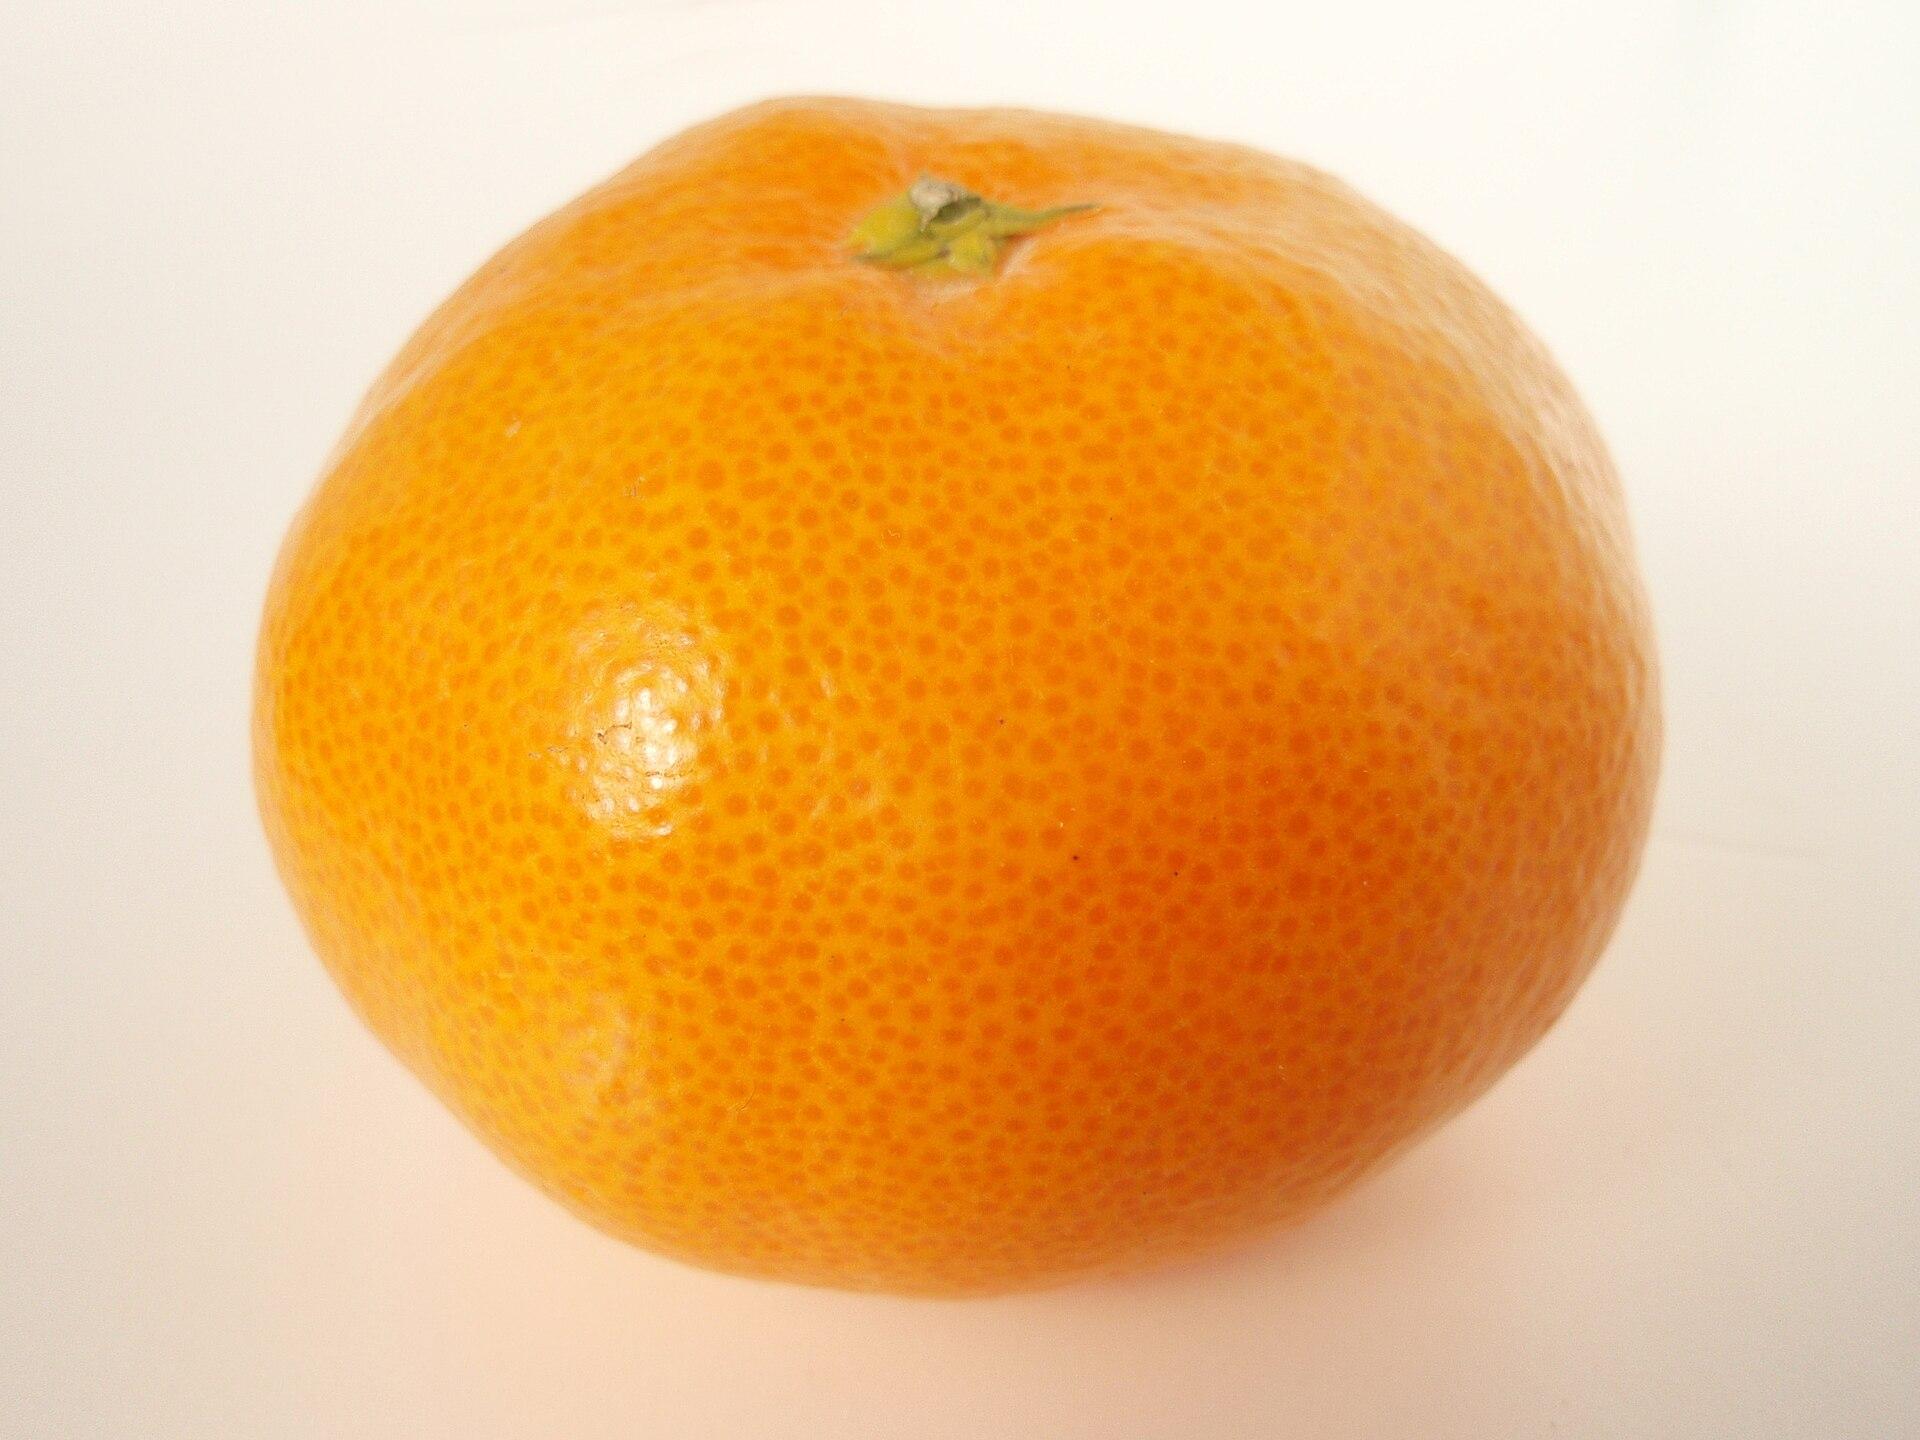 Citrus Unshiu group - Wikimedia Commons